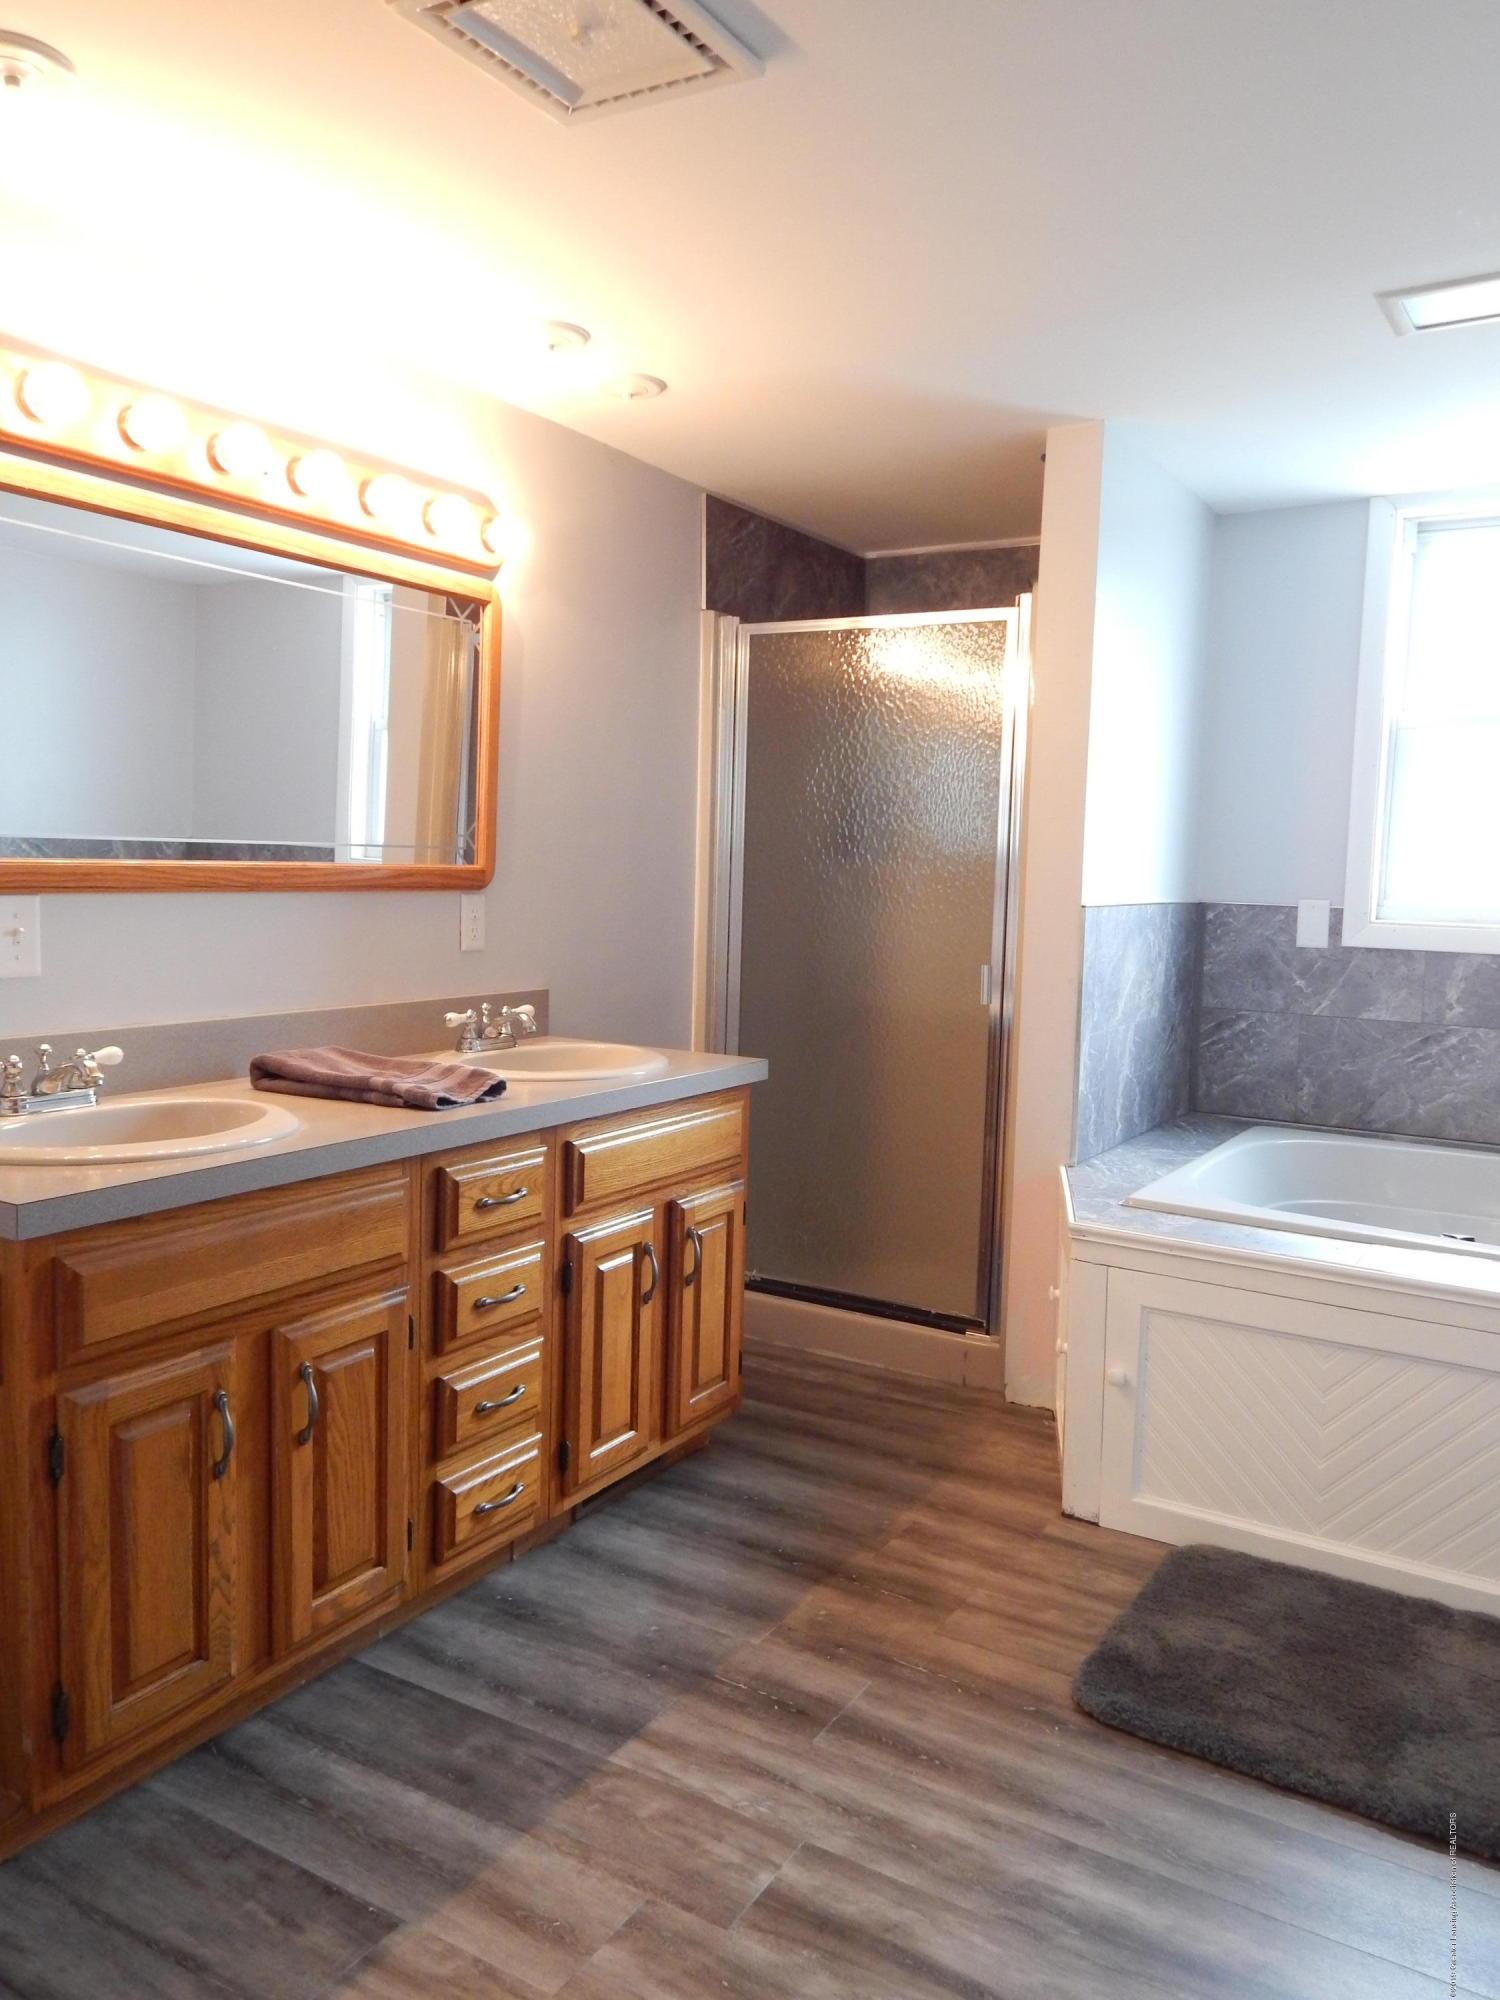 2605 Hazelwood Dr - Bathroom - 11